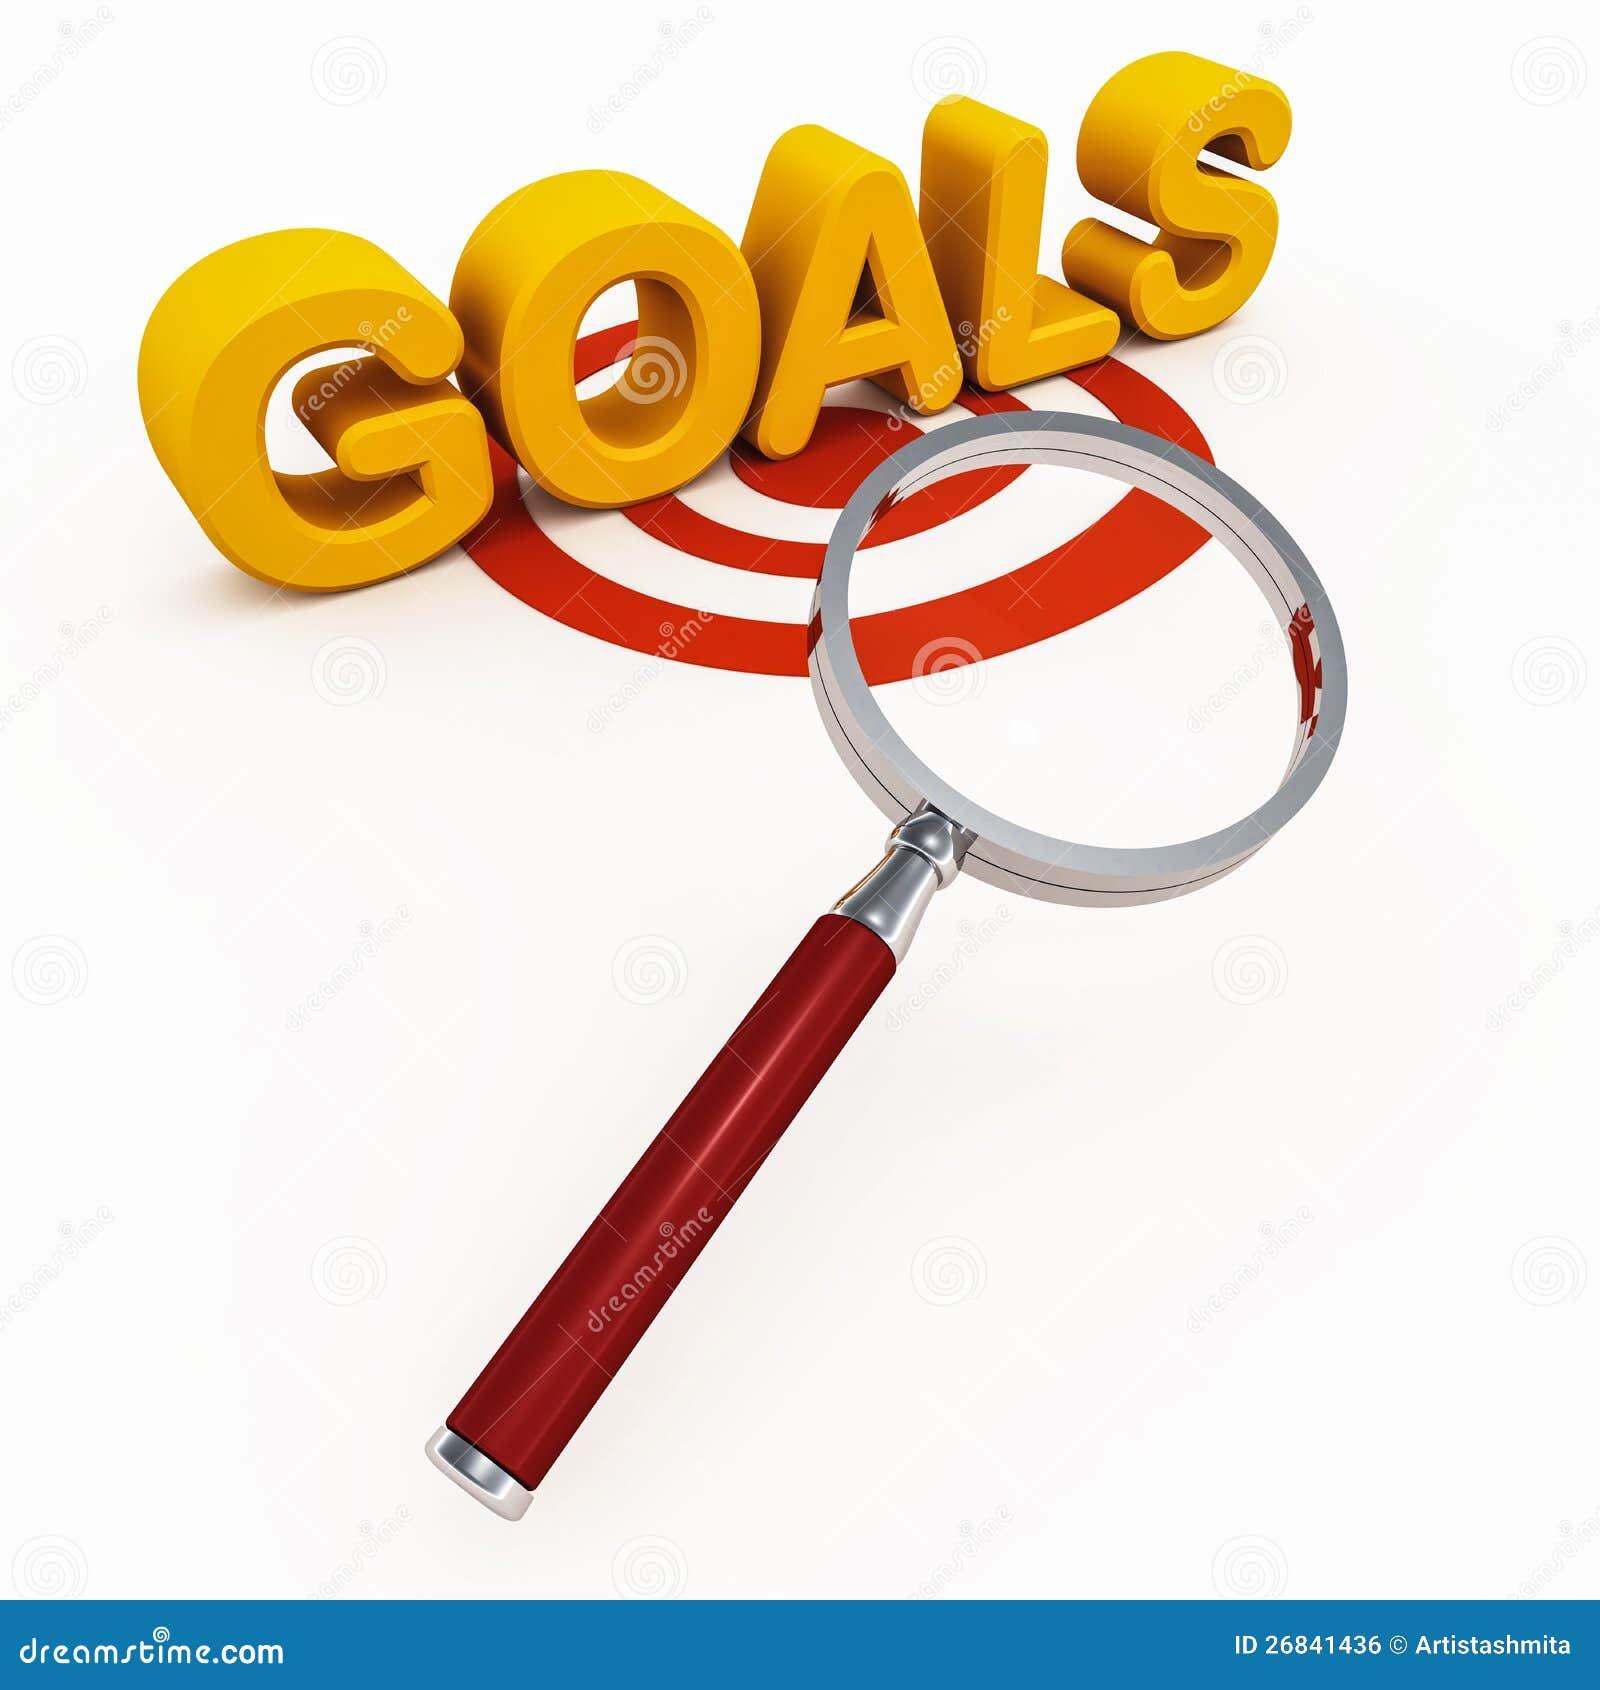 career goals in education essay